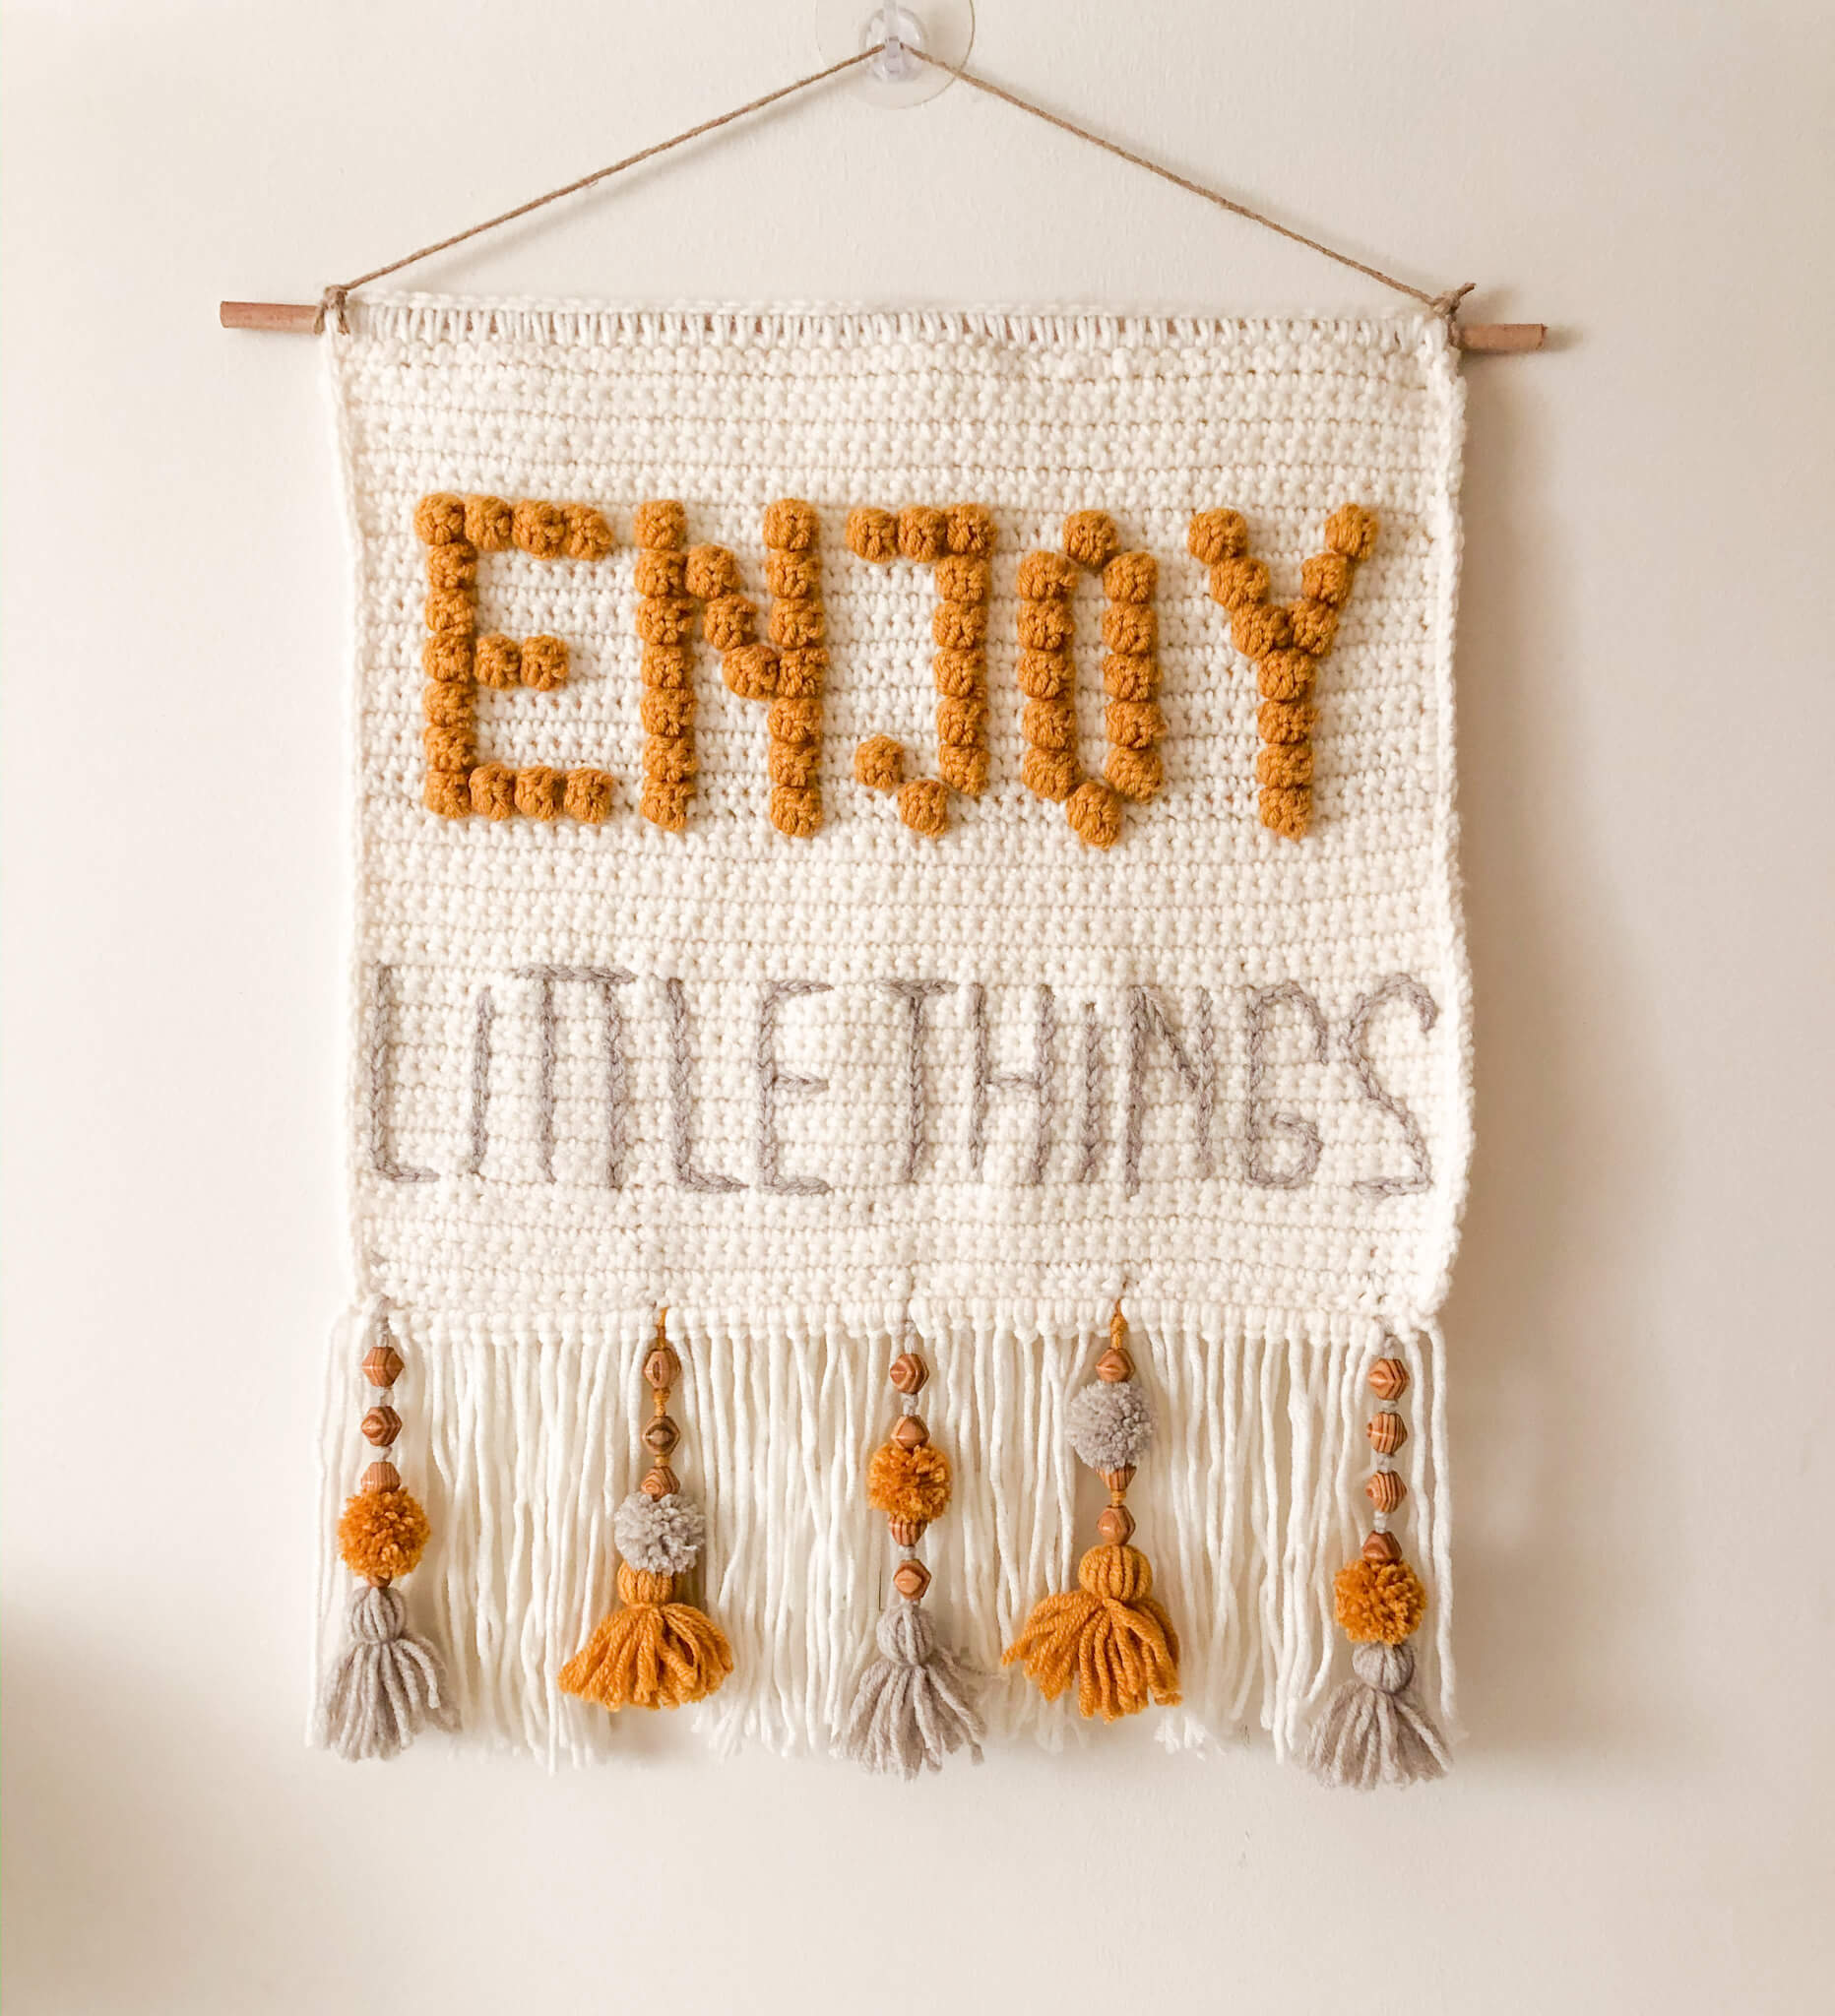 """ENJOY LITTLE THINGS"" CROCHET WALL HANGING"